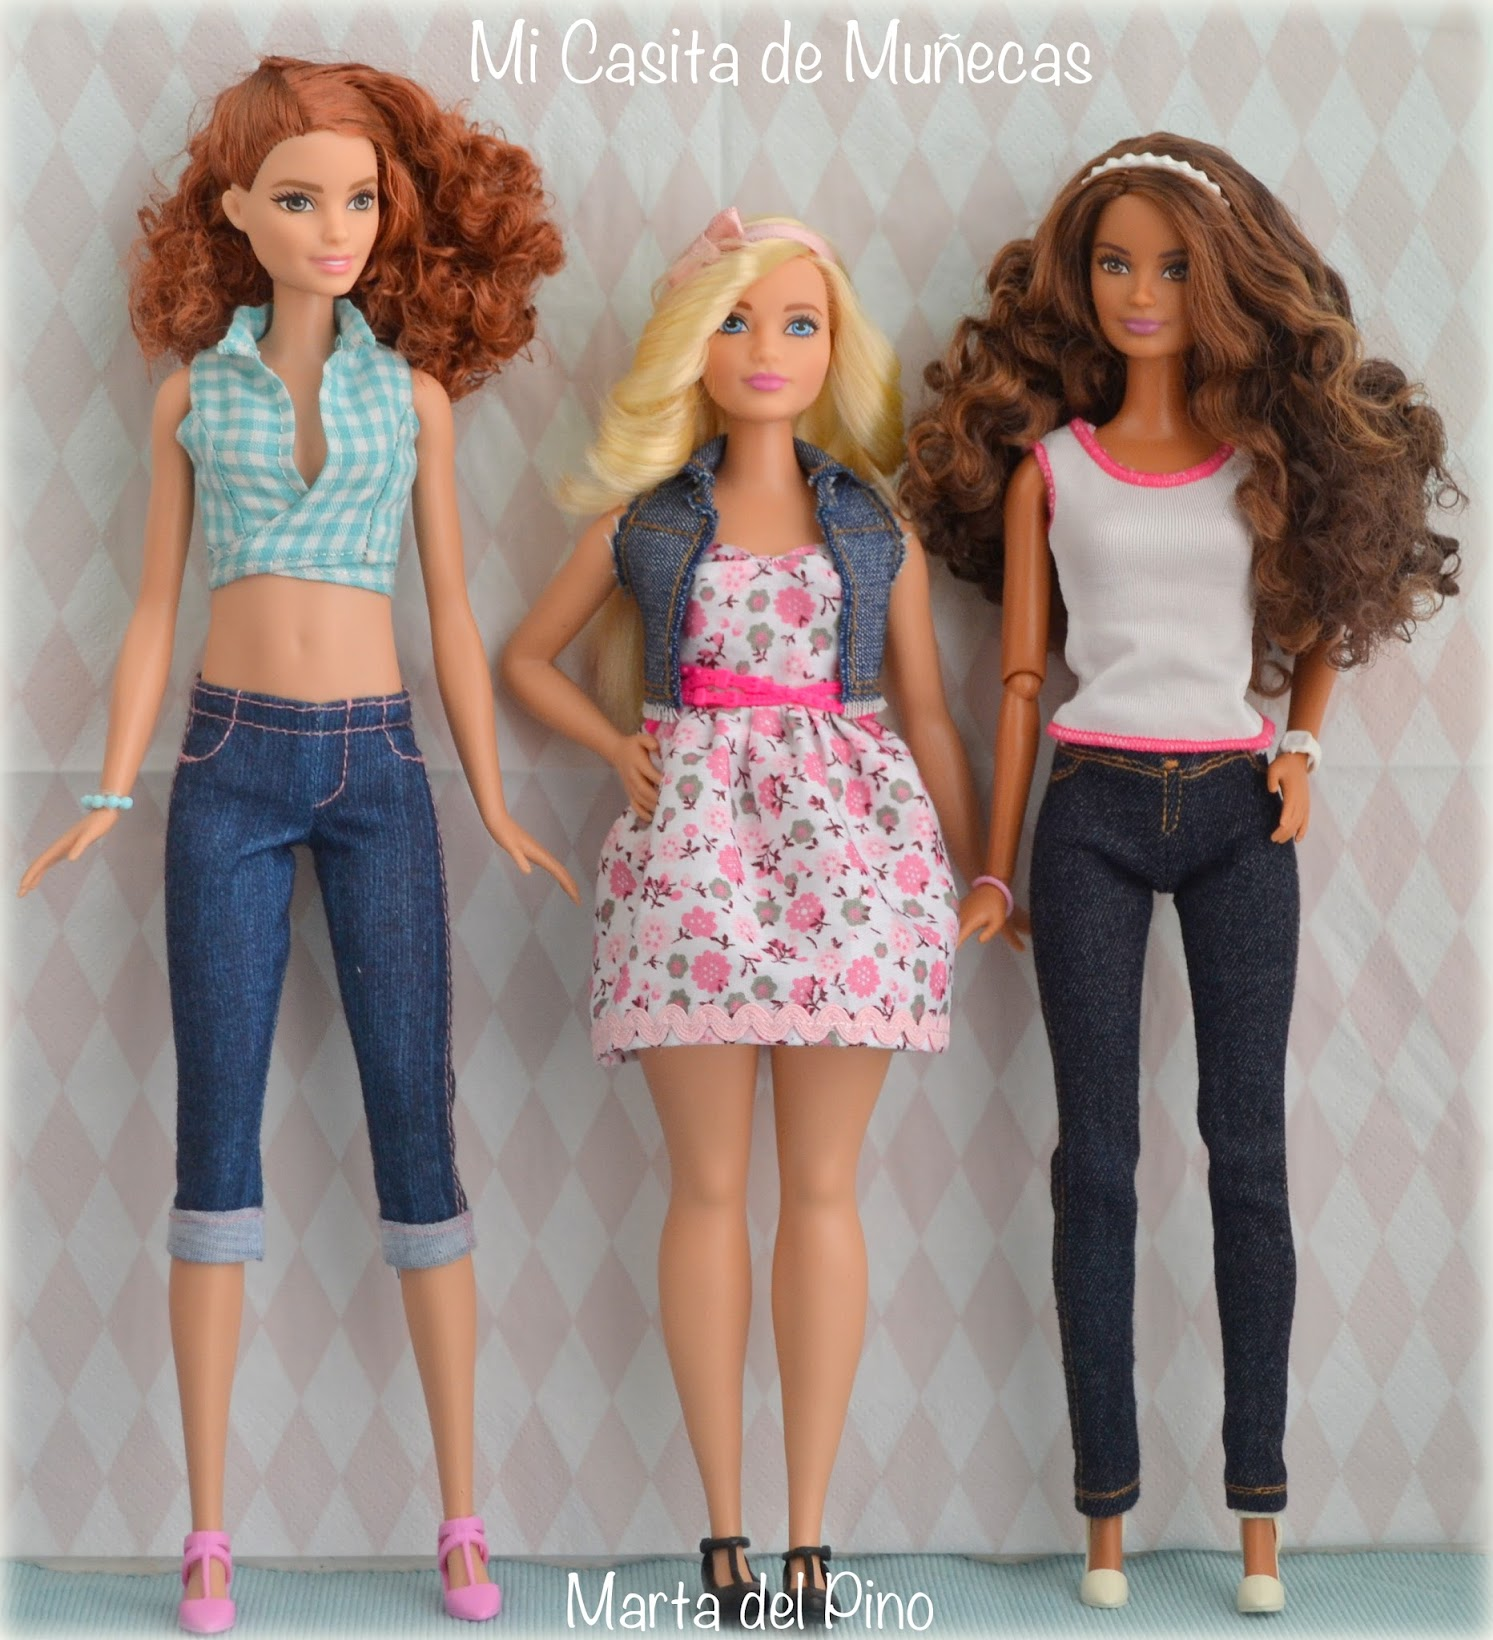 Barbie fashionistas 2016, curvy, tall, petit,  barbie nuevo cuerpo, barbie new body, mi casita de muñecas